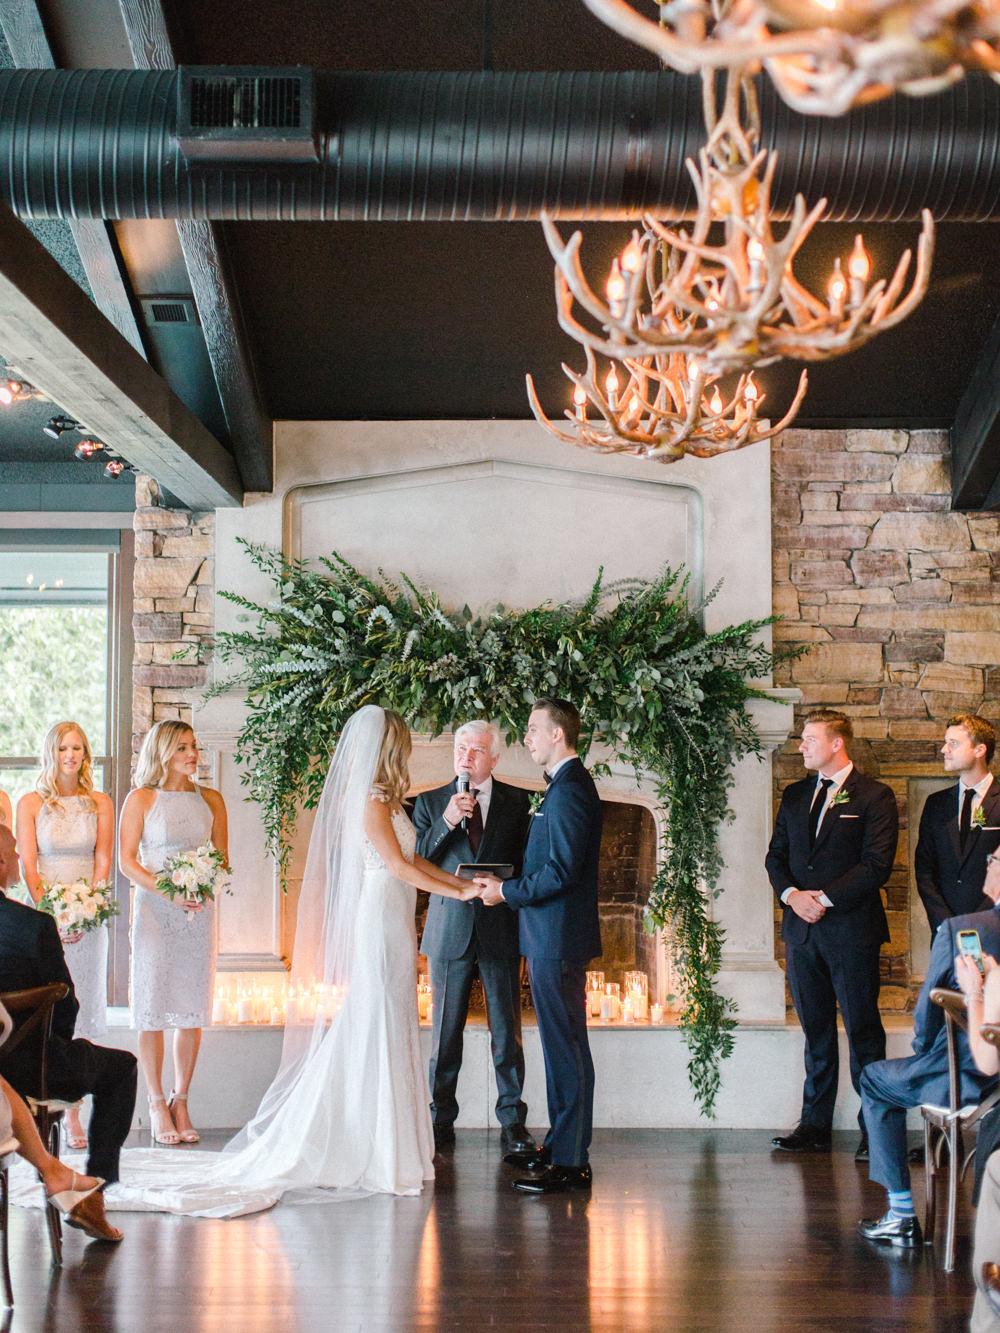 Breatt-and-Katies-romantic-Lake-house-wedding-Calgary-15.jpg